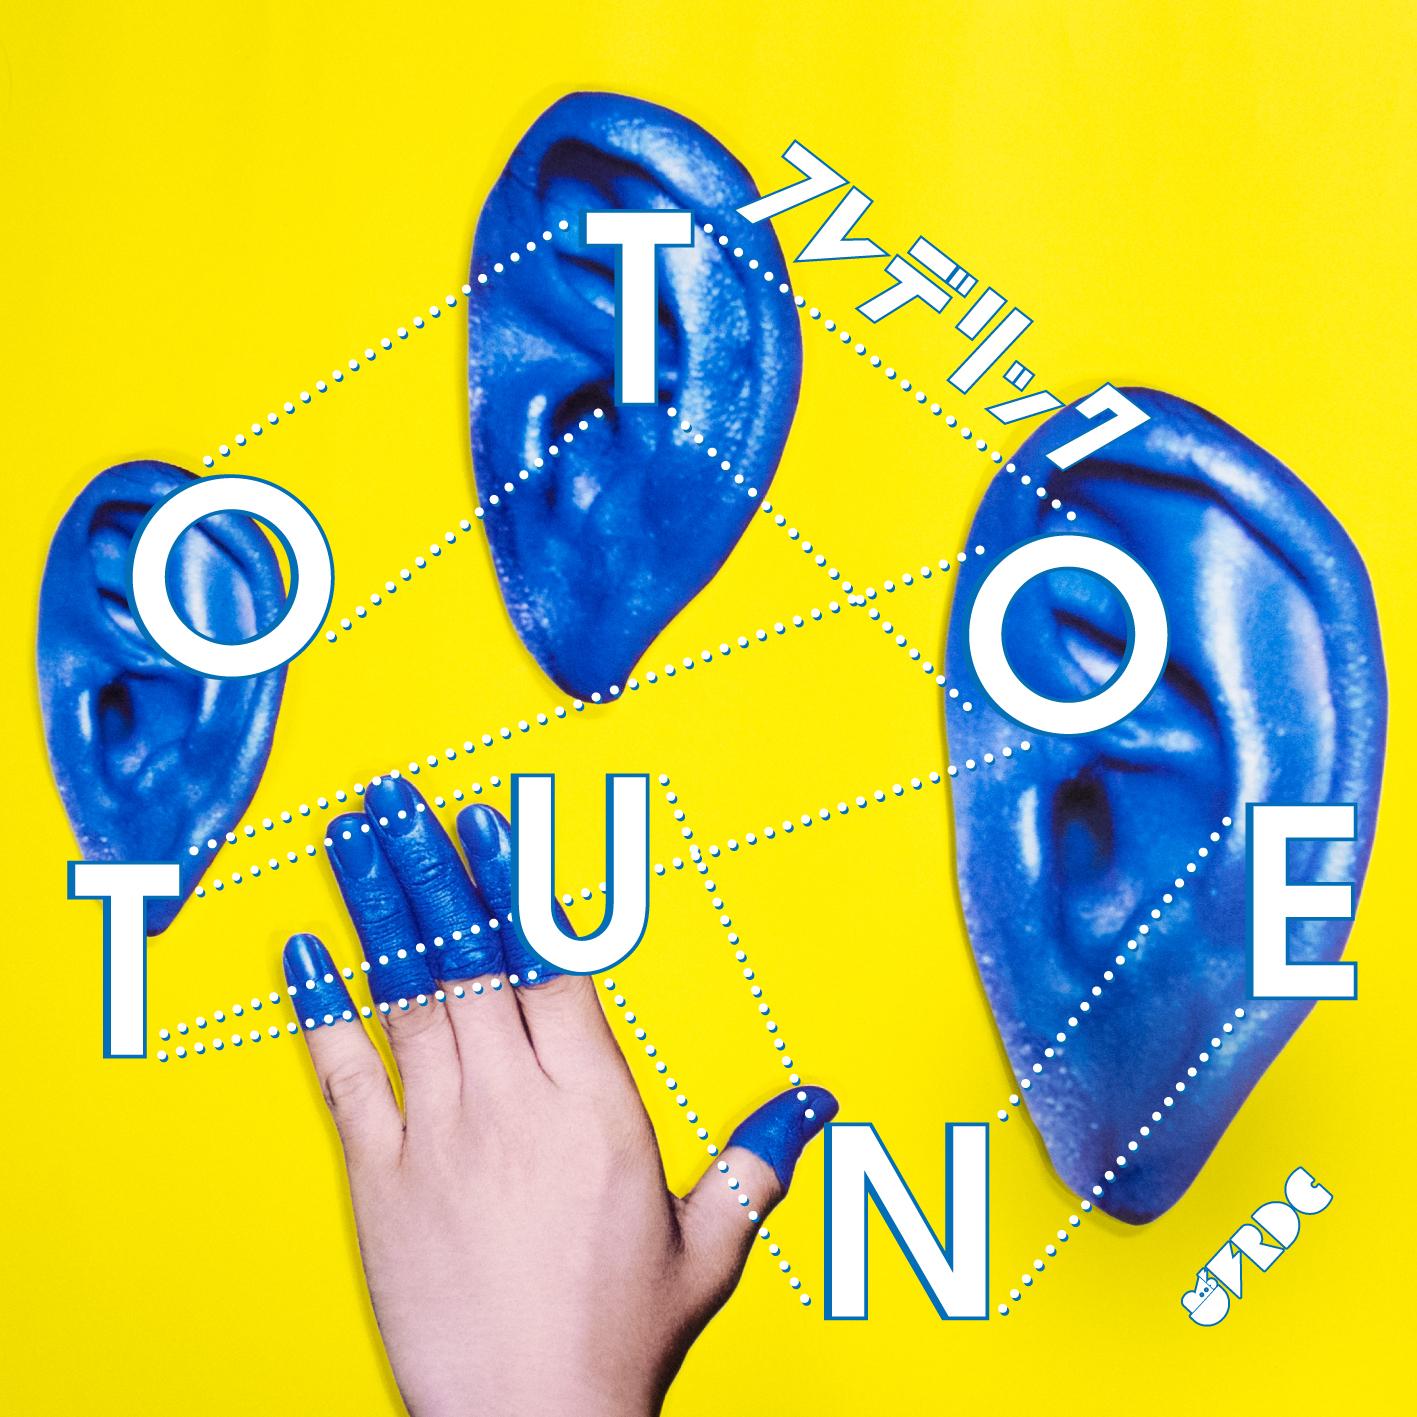 『OTOTUNE』